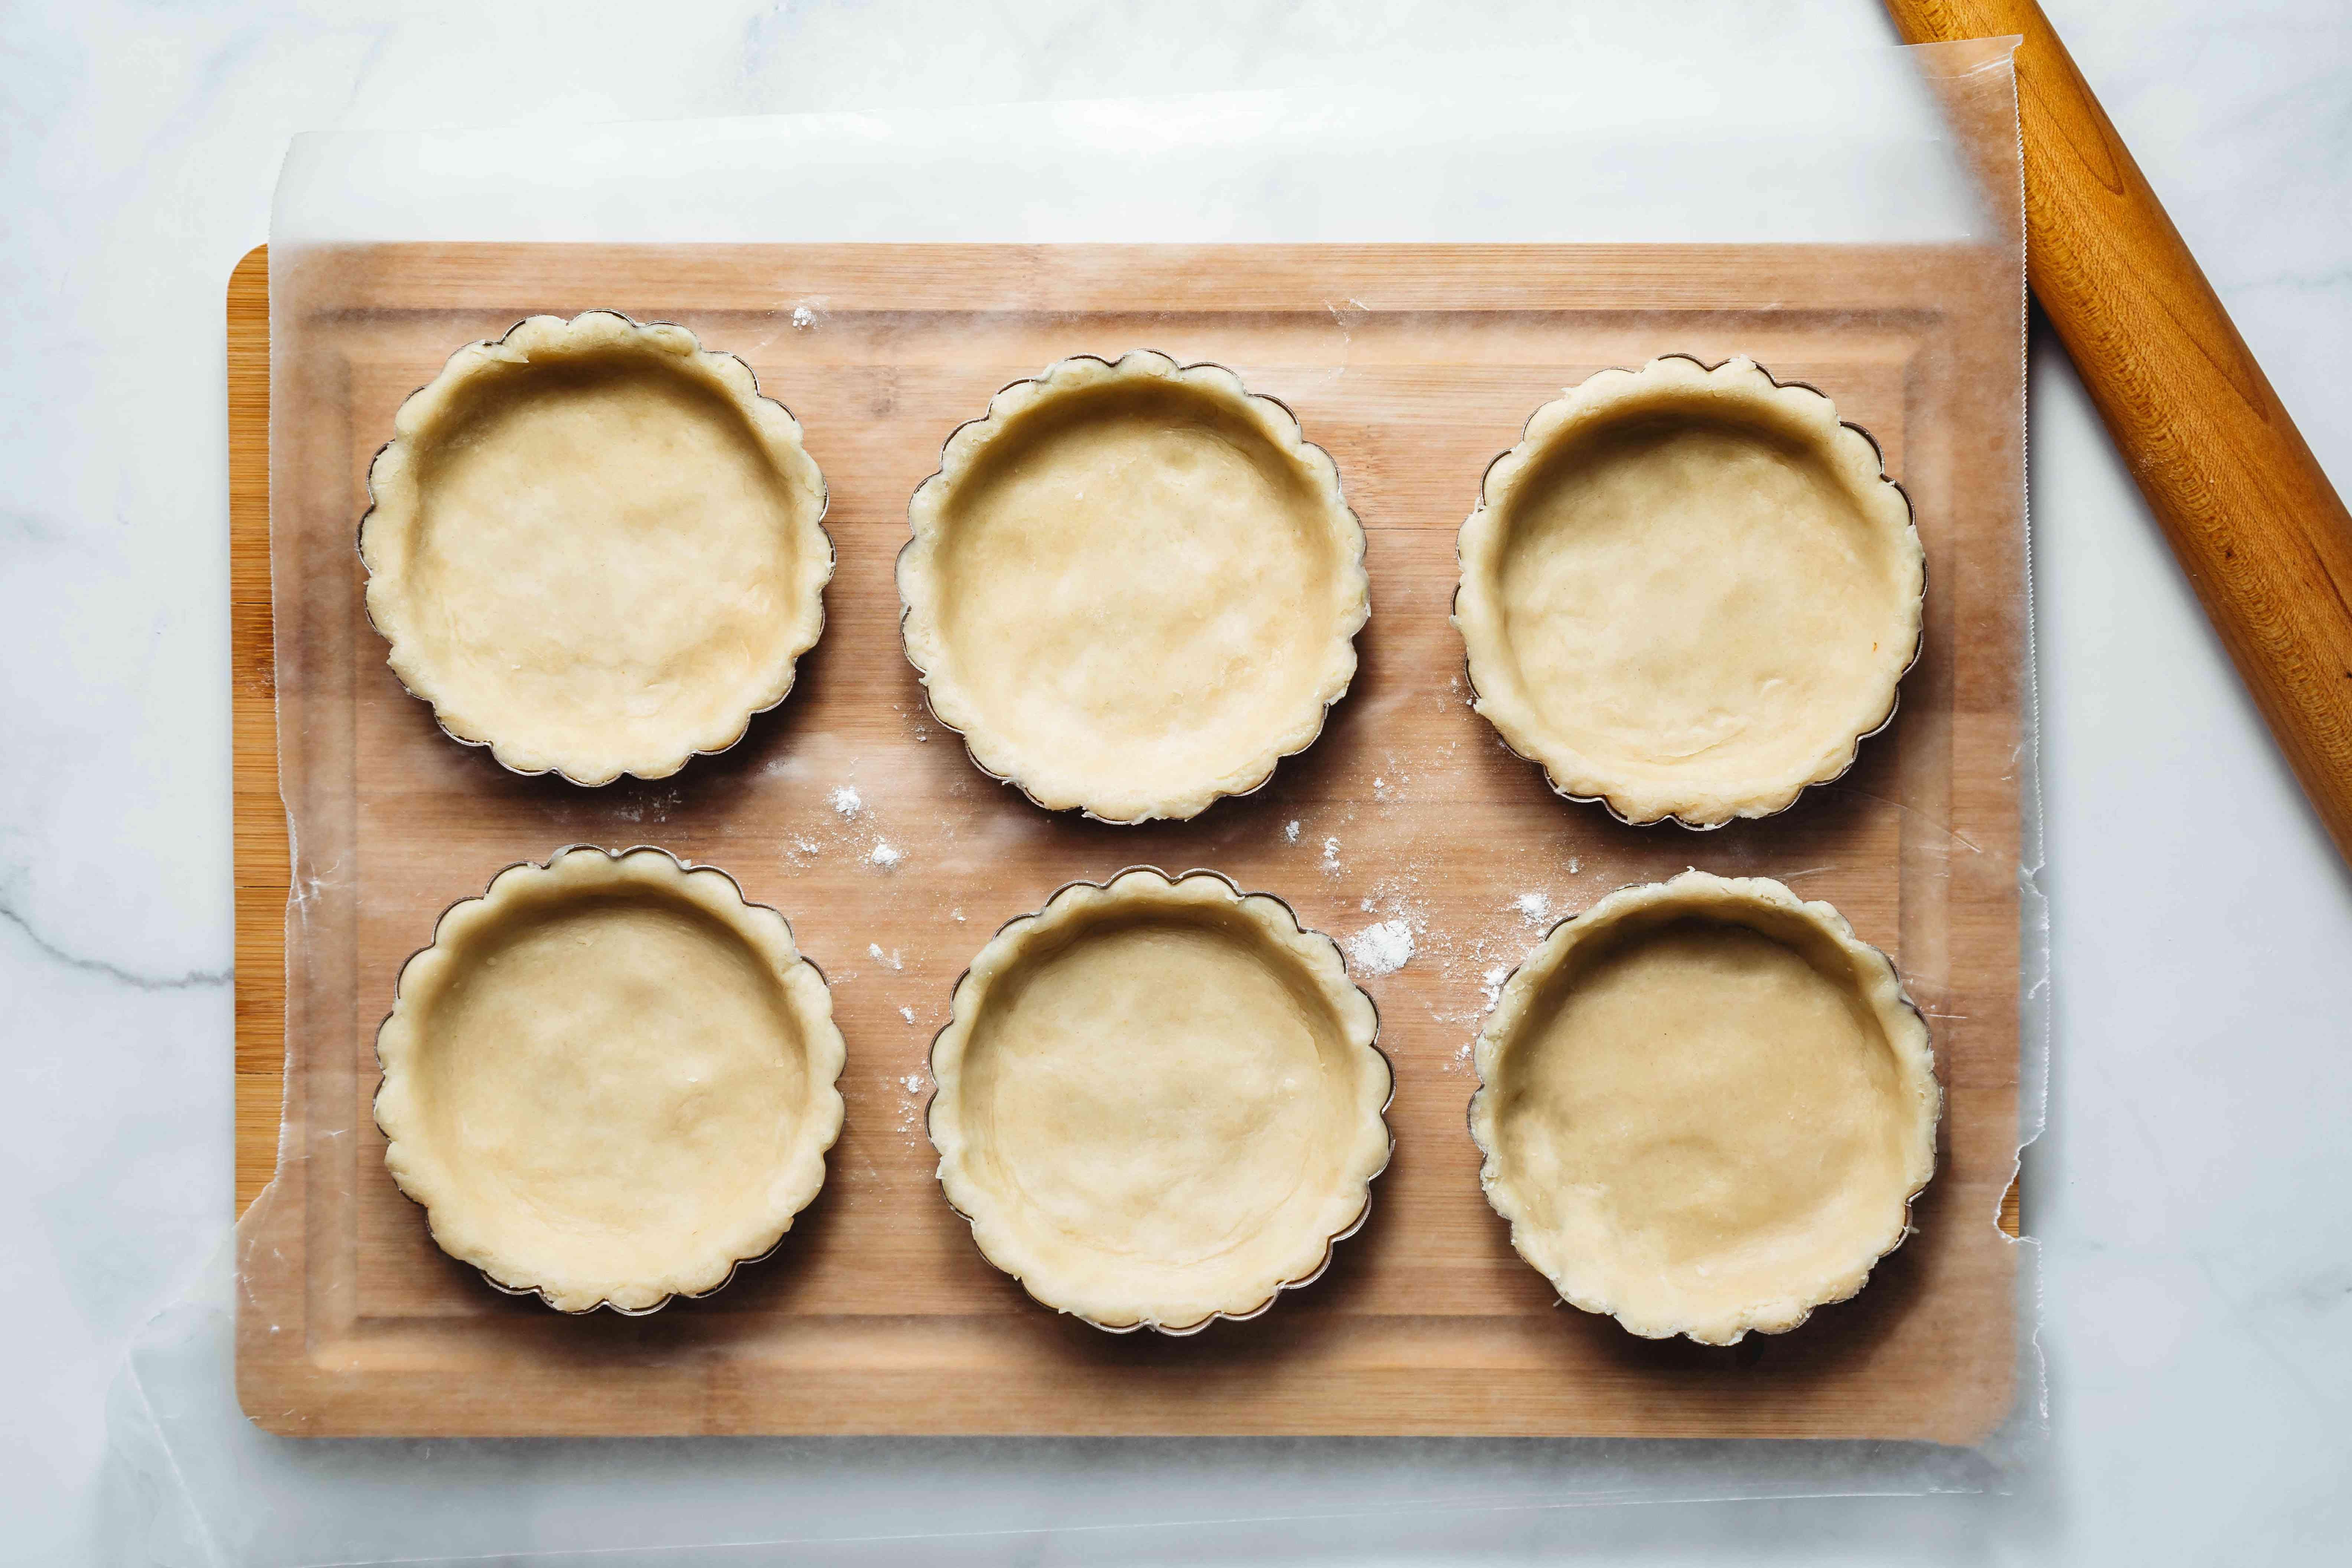 tart dough in tart tins